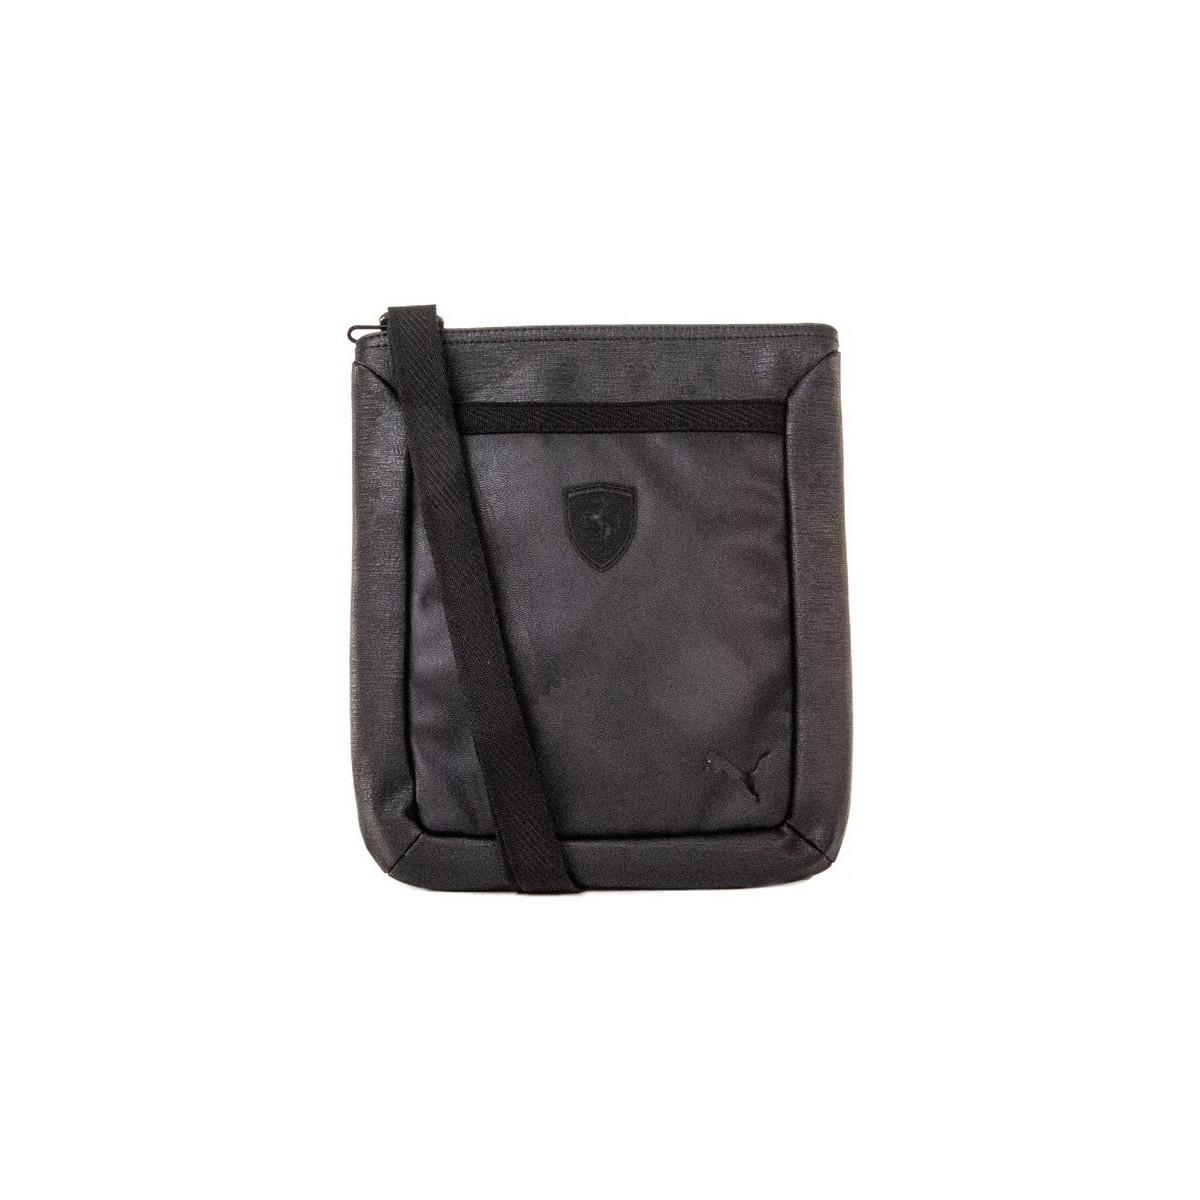 PUMA Sf Ls Flat Portable Men s Pouch In Black in Black for Men - Lyst 4b34b312bdeaf